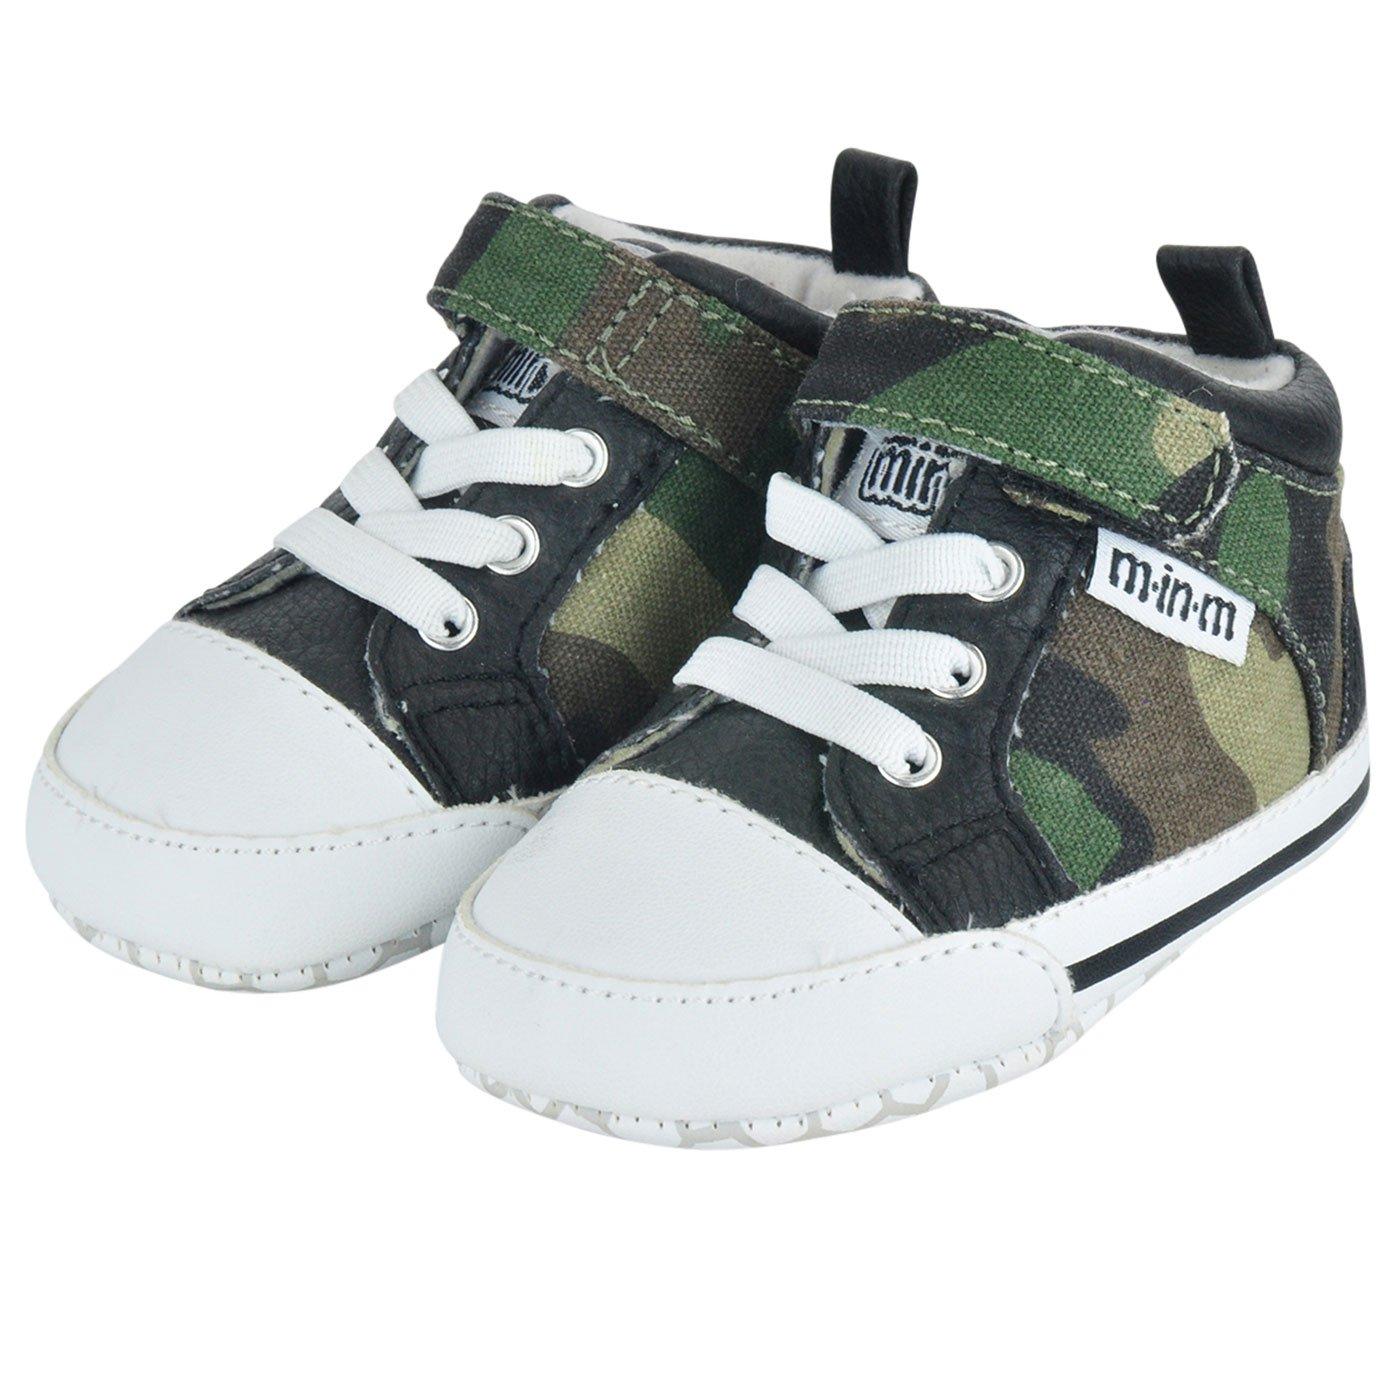 bb622a9aeab0 Amazon.com  High Top Baby Shoes Camoflauge Soft Sole Flexible Camo Boy Girl  Prewalker infant  Shoes